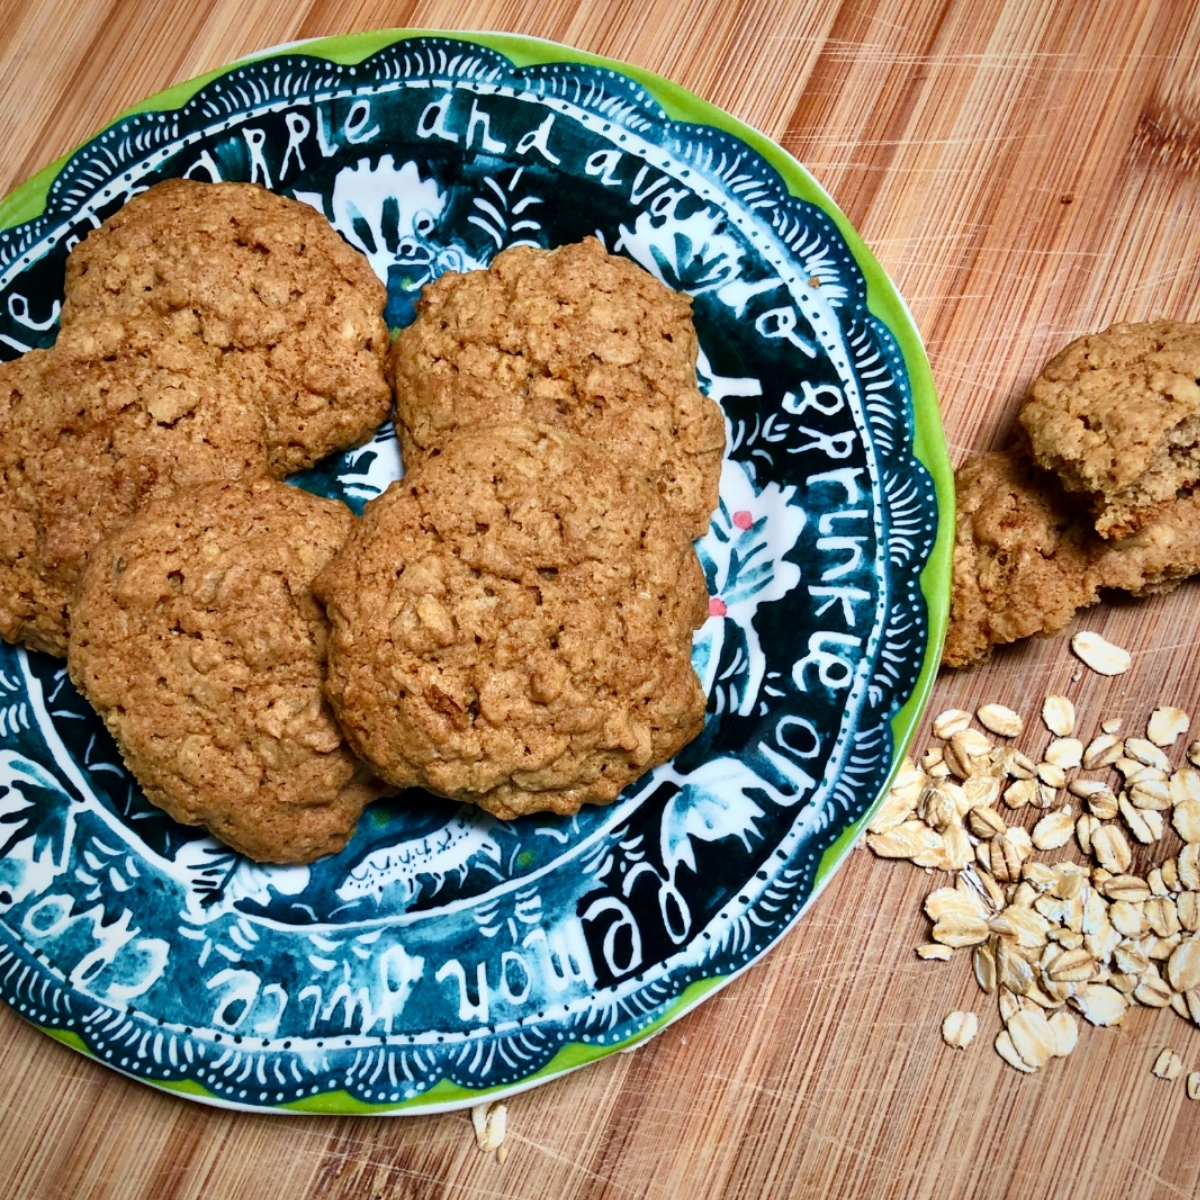 Vegan oatmeal cookies arranged on a decorative plate.